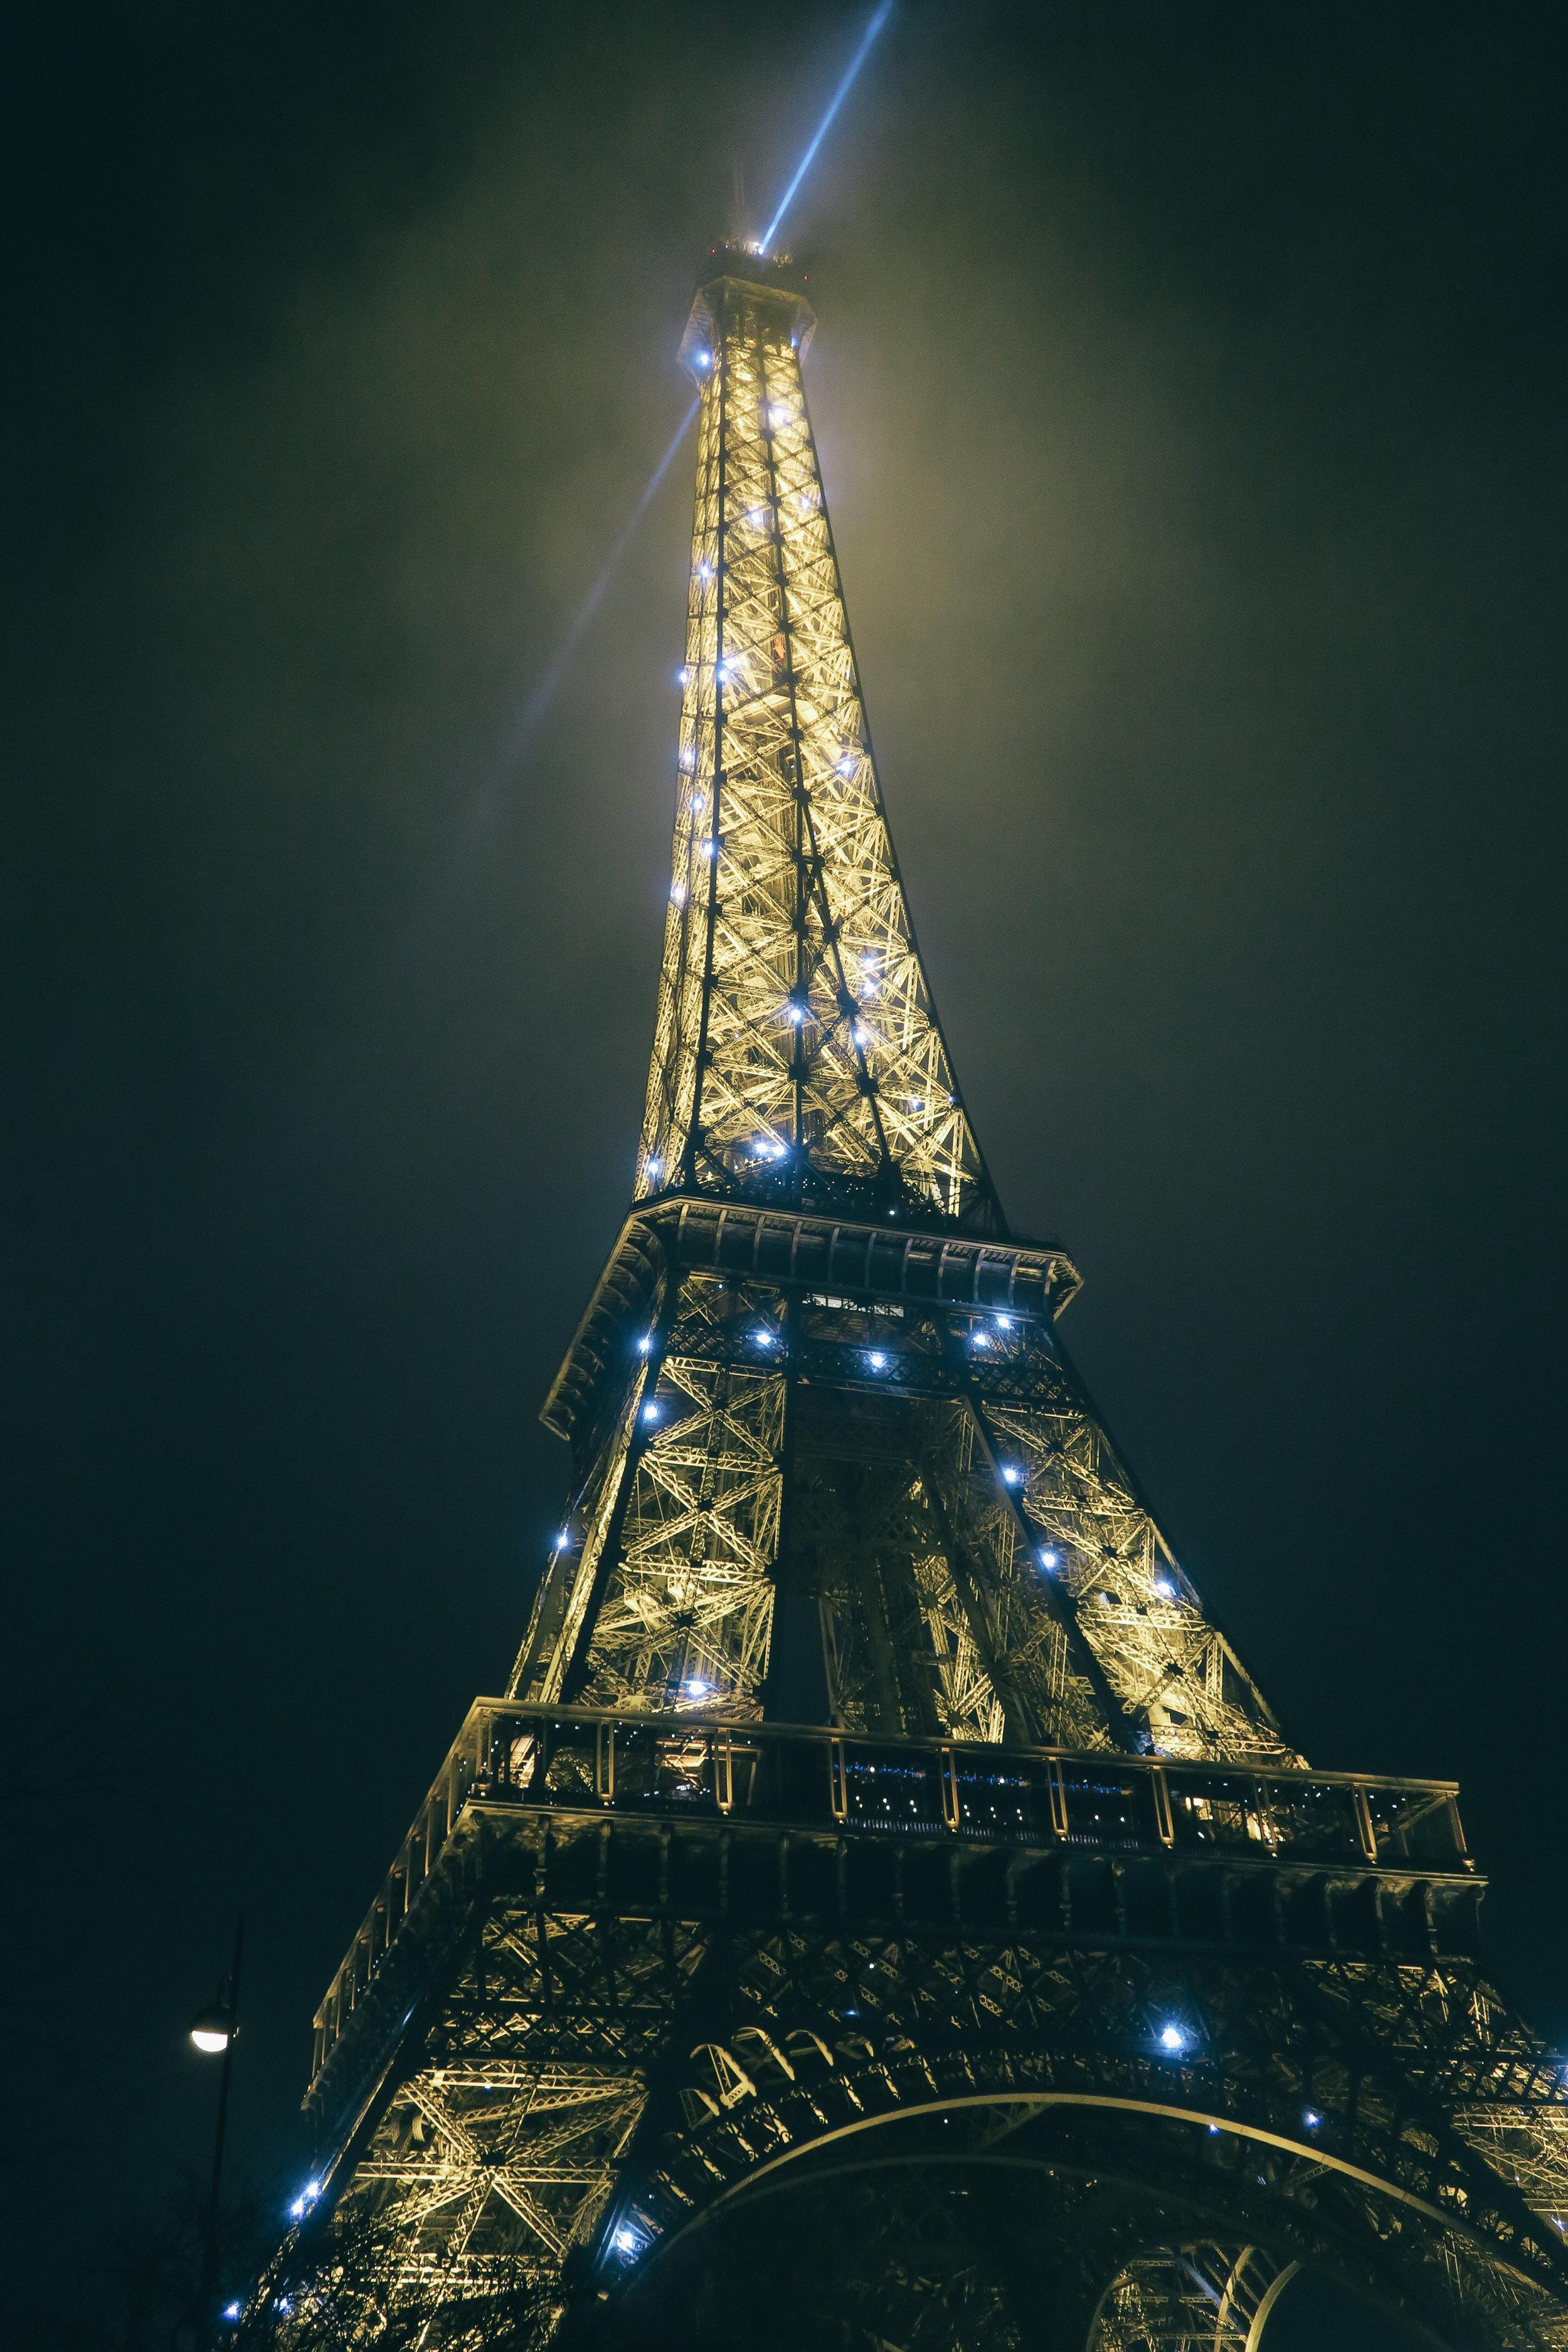 paris-france-travel-guide-lifeonpine_IMG_0361.jpg